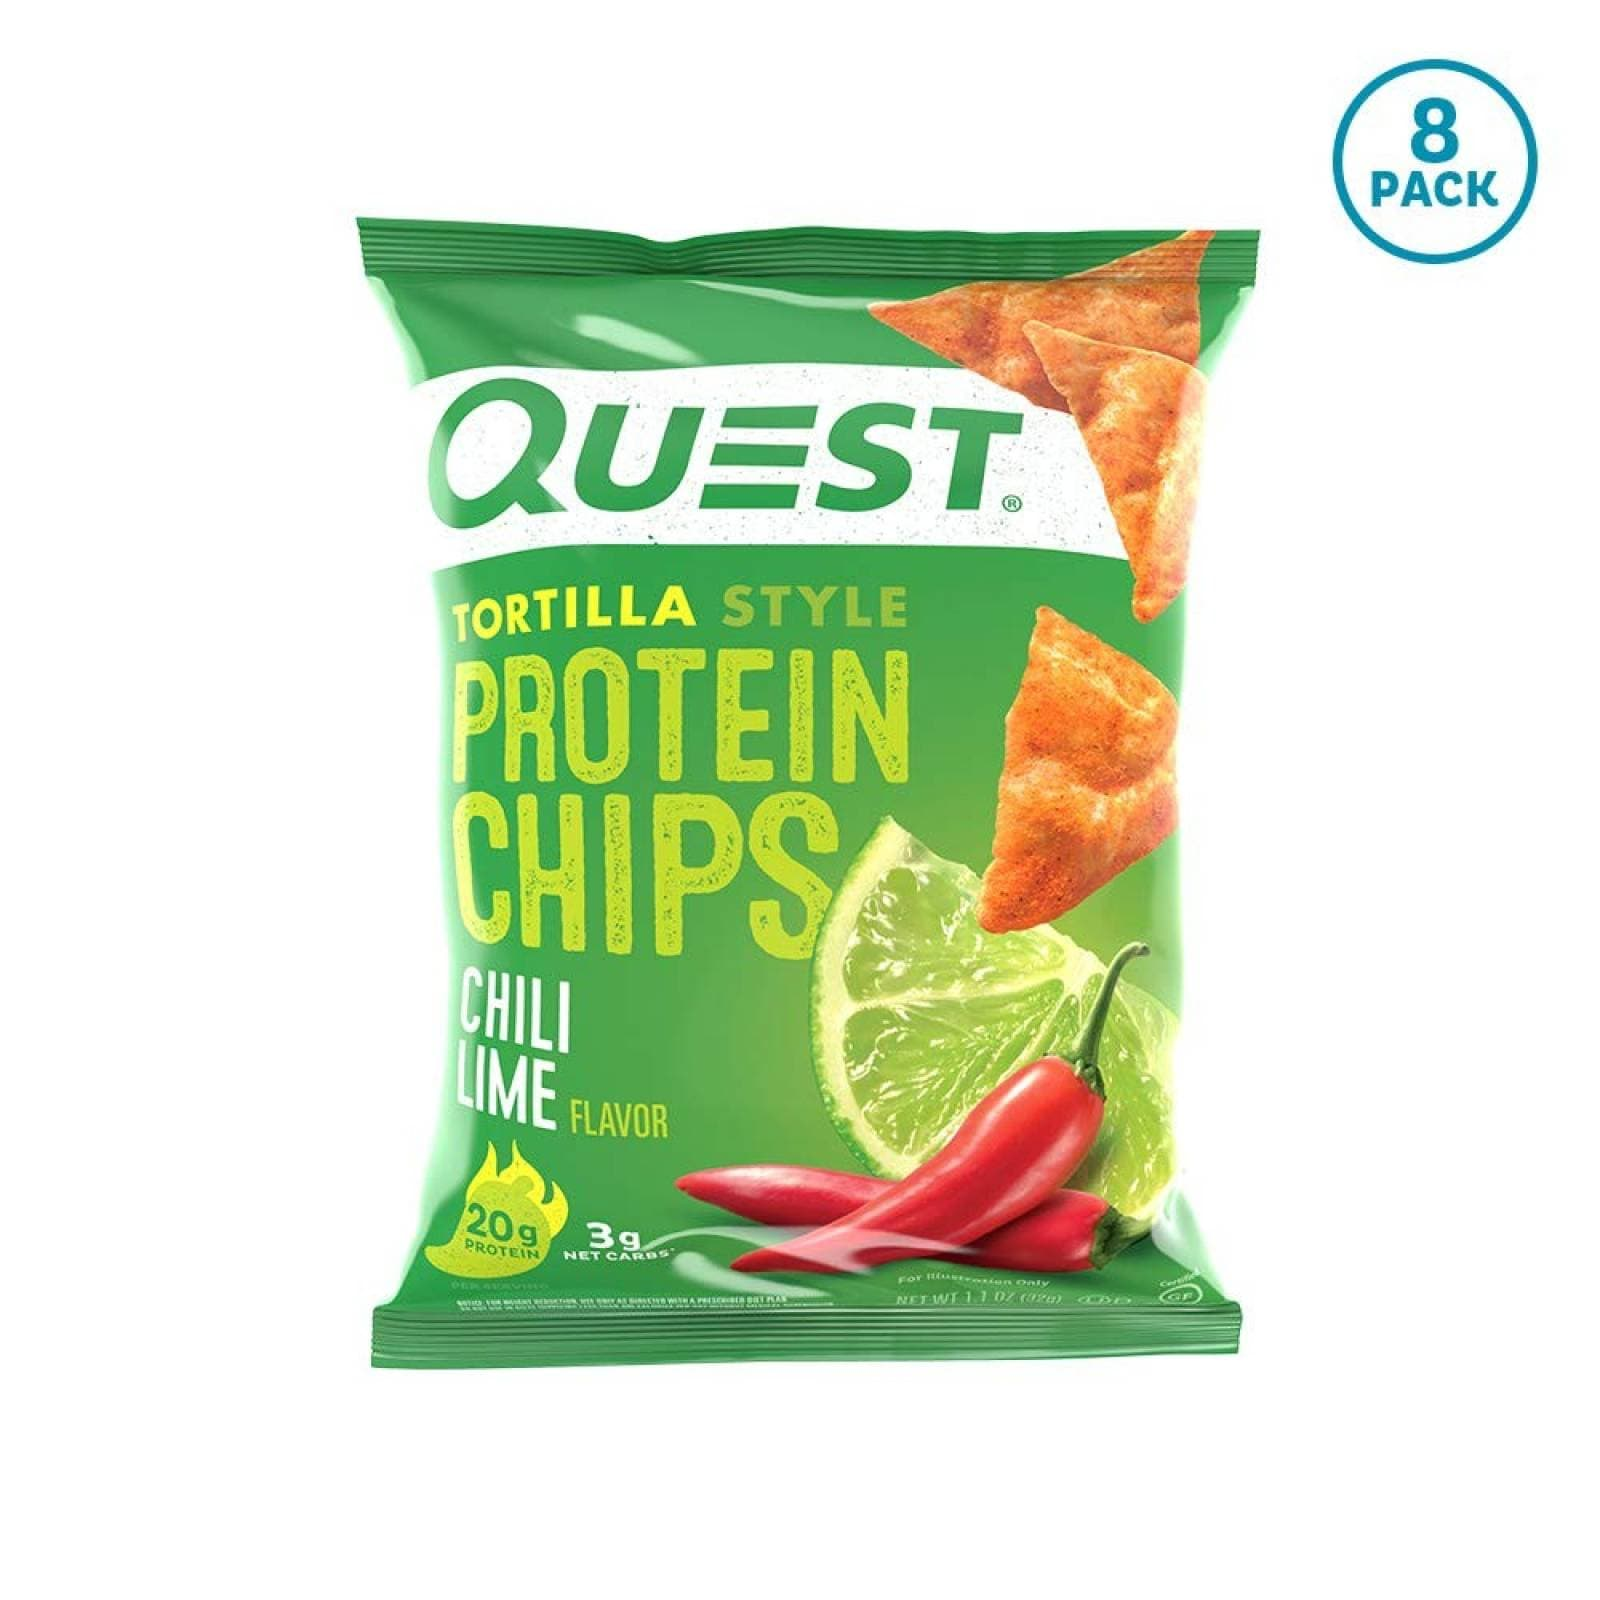 Chips Proteína Quest Nutrition Chile-Limón Tortilla -8 pzs